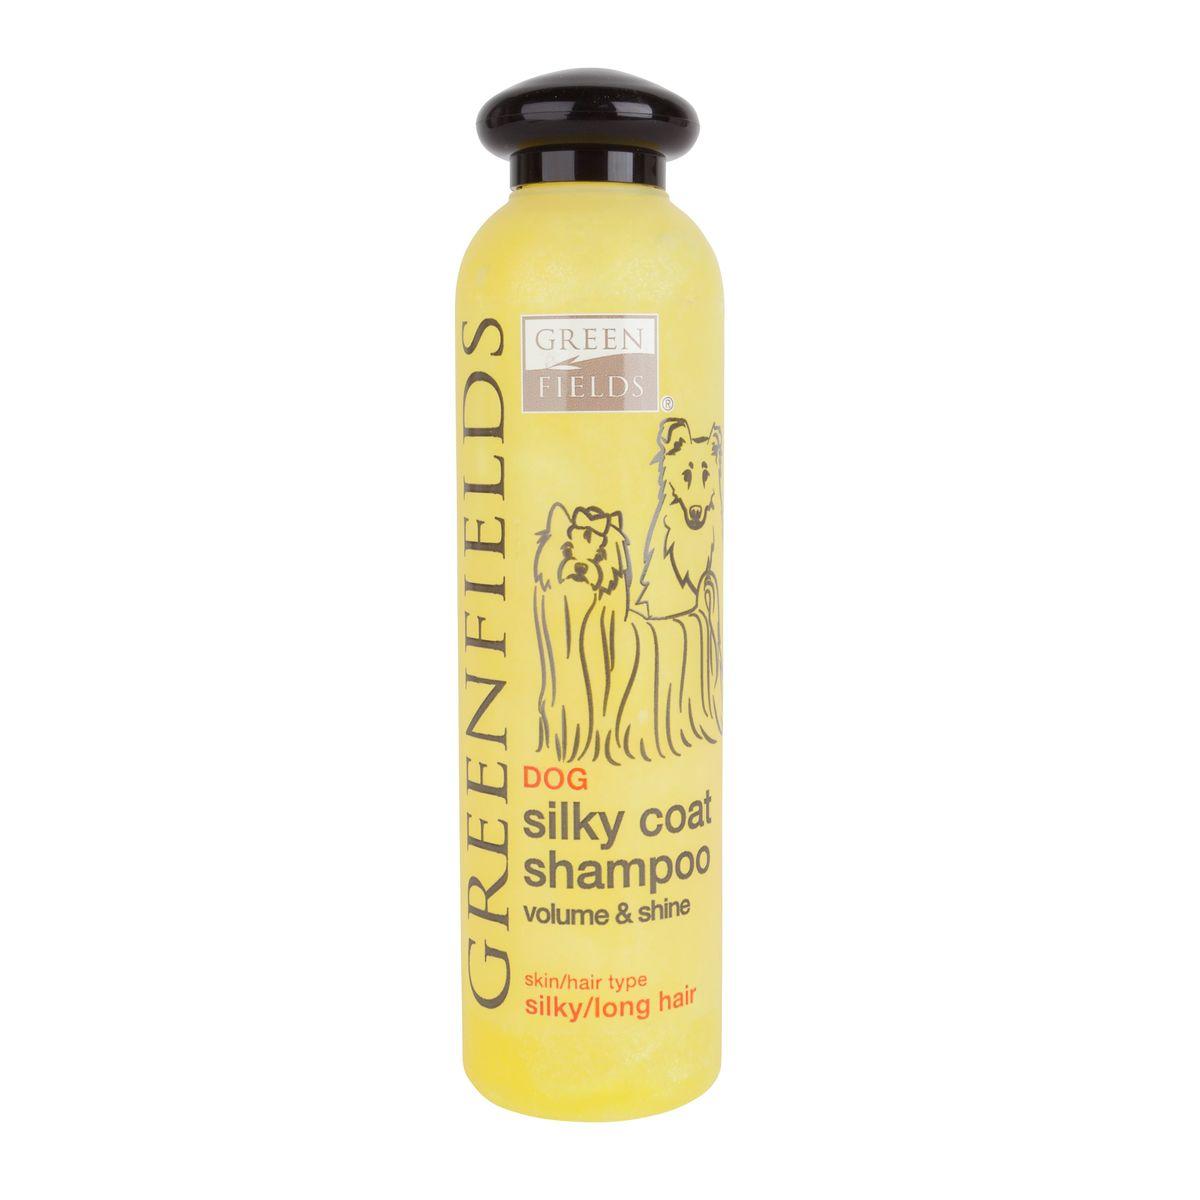 Greenfields Dog Silky Coat Shampoo